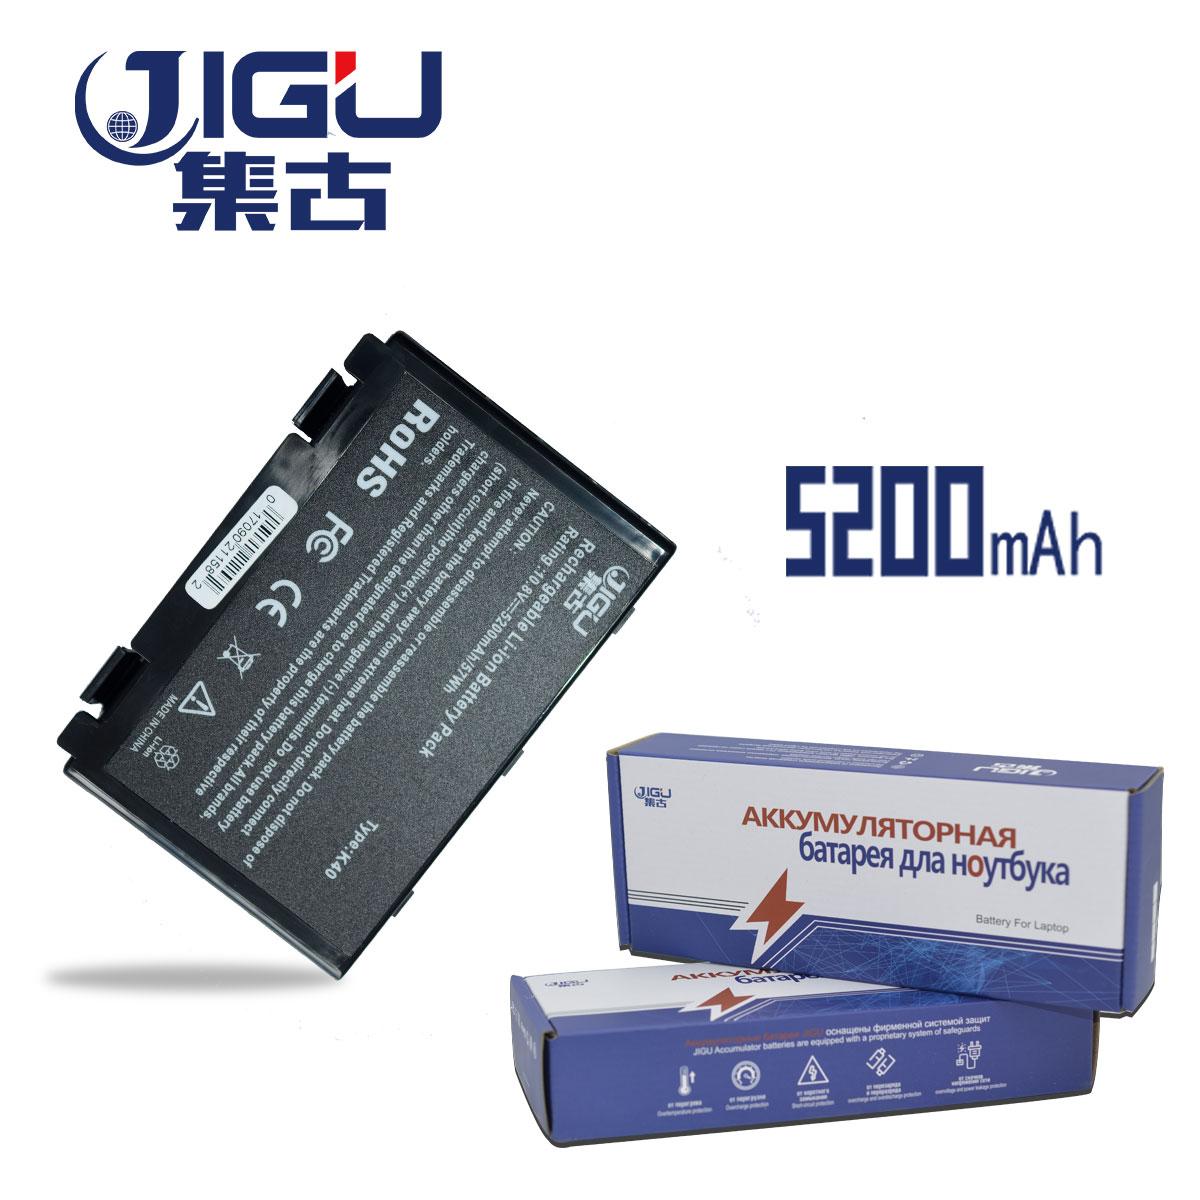 Jigu 5200 Mah Da Bateria Do Porttil Para Asus A32 F82 Lm3530 White Led Driver Circuit Design Electronic Project F52 K50ij K42j K42 K40 K40in K50 K51 K50ab K50in K60 K61 K70